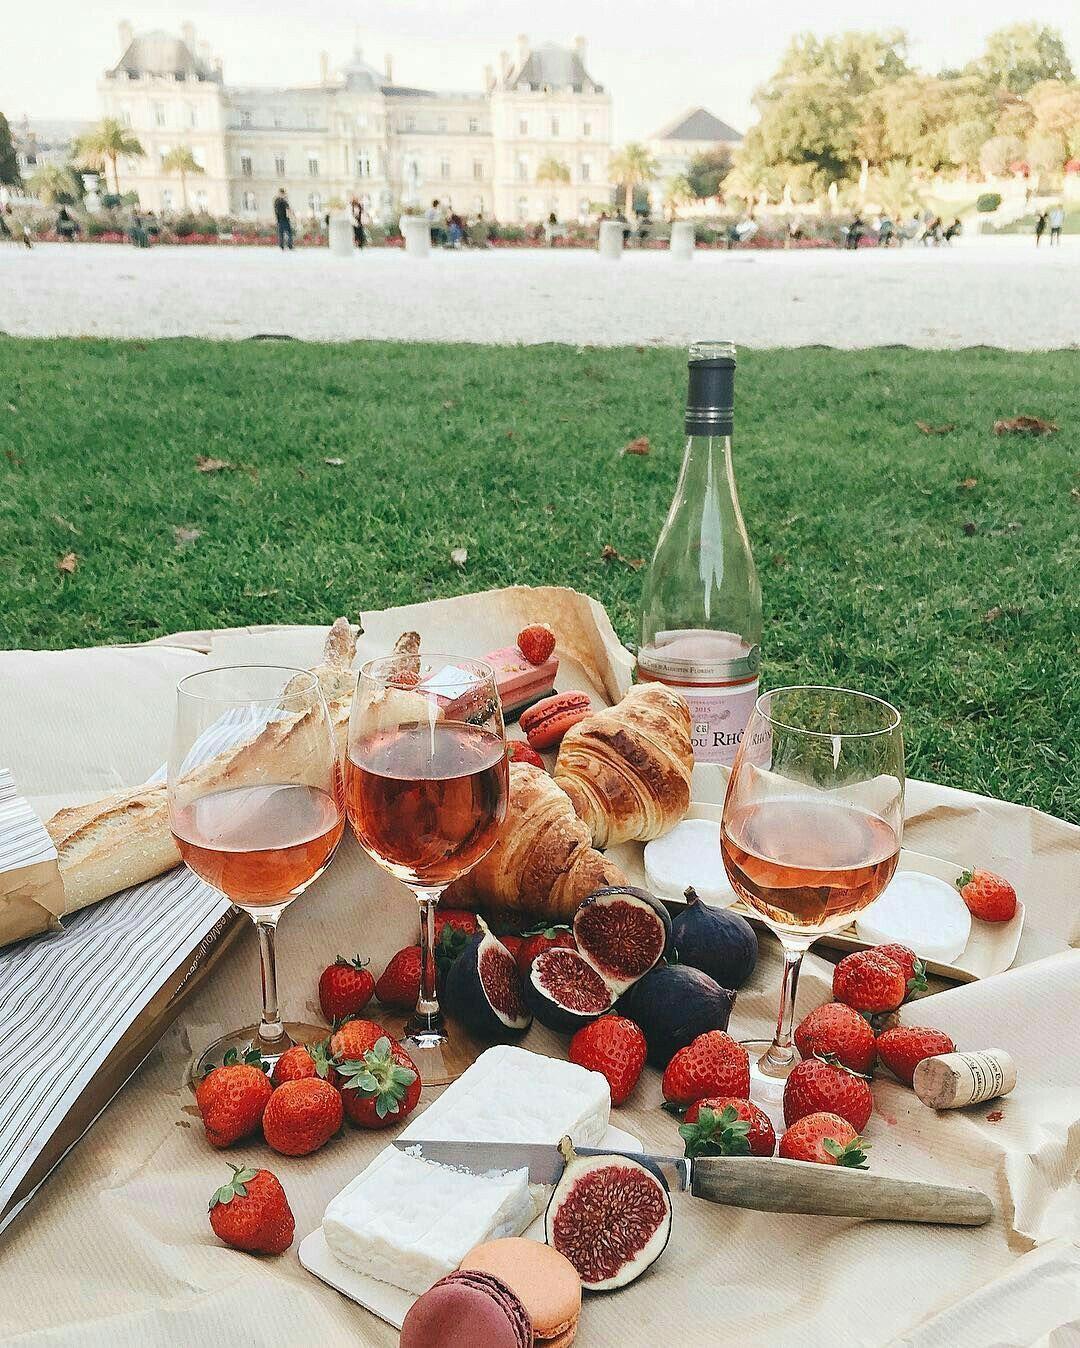 picnic wine   Picknick essen, Romantische picknicks